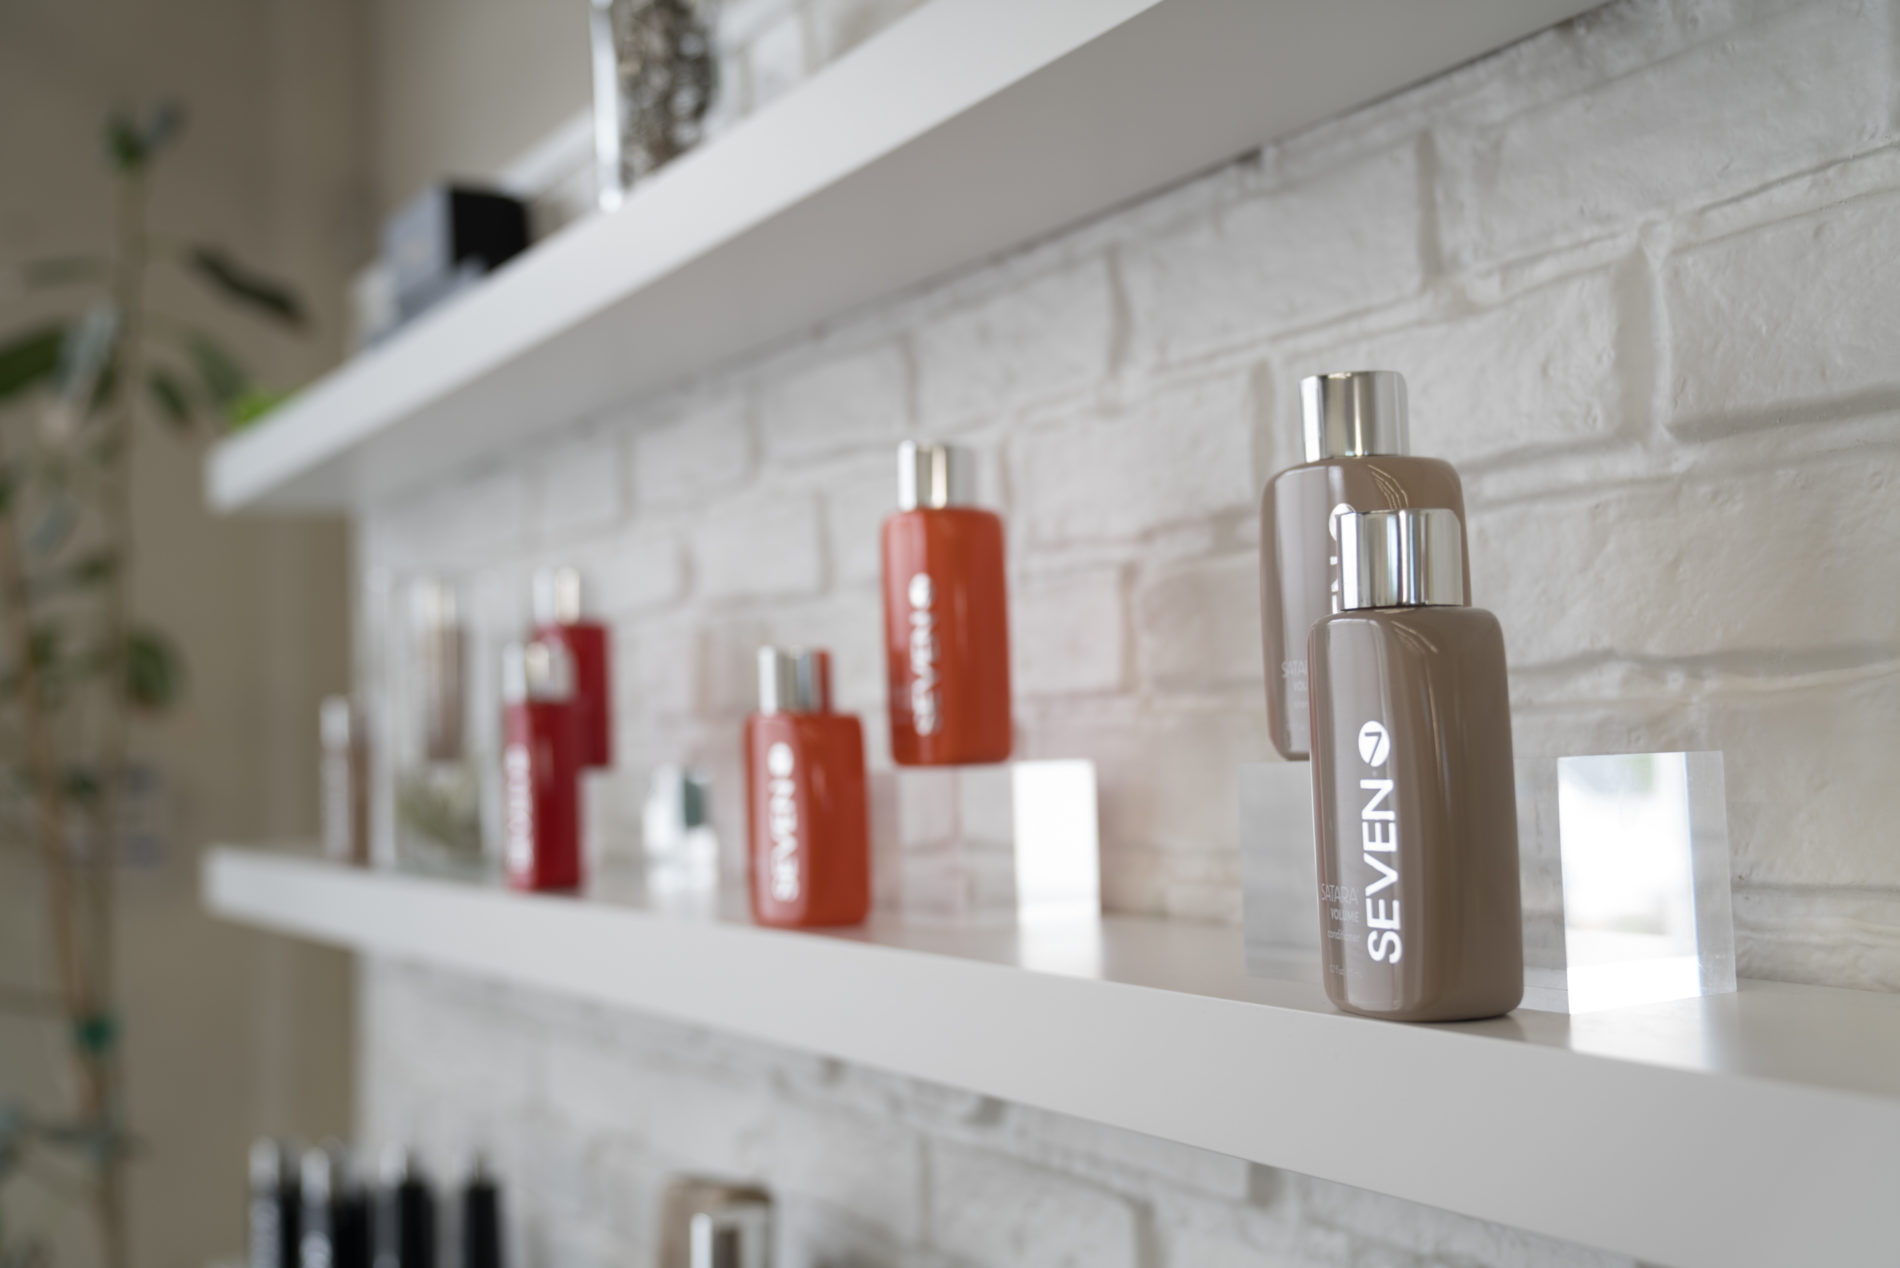 salon hair care products